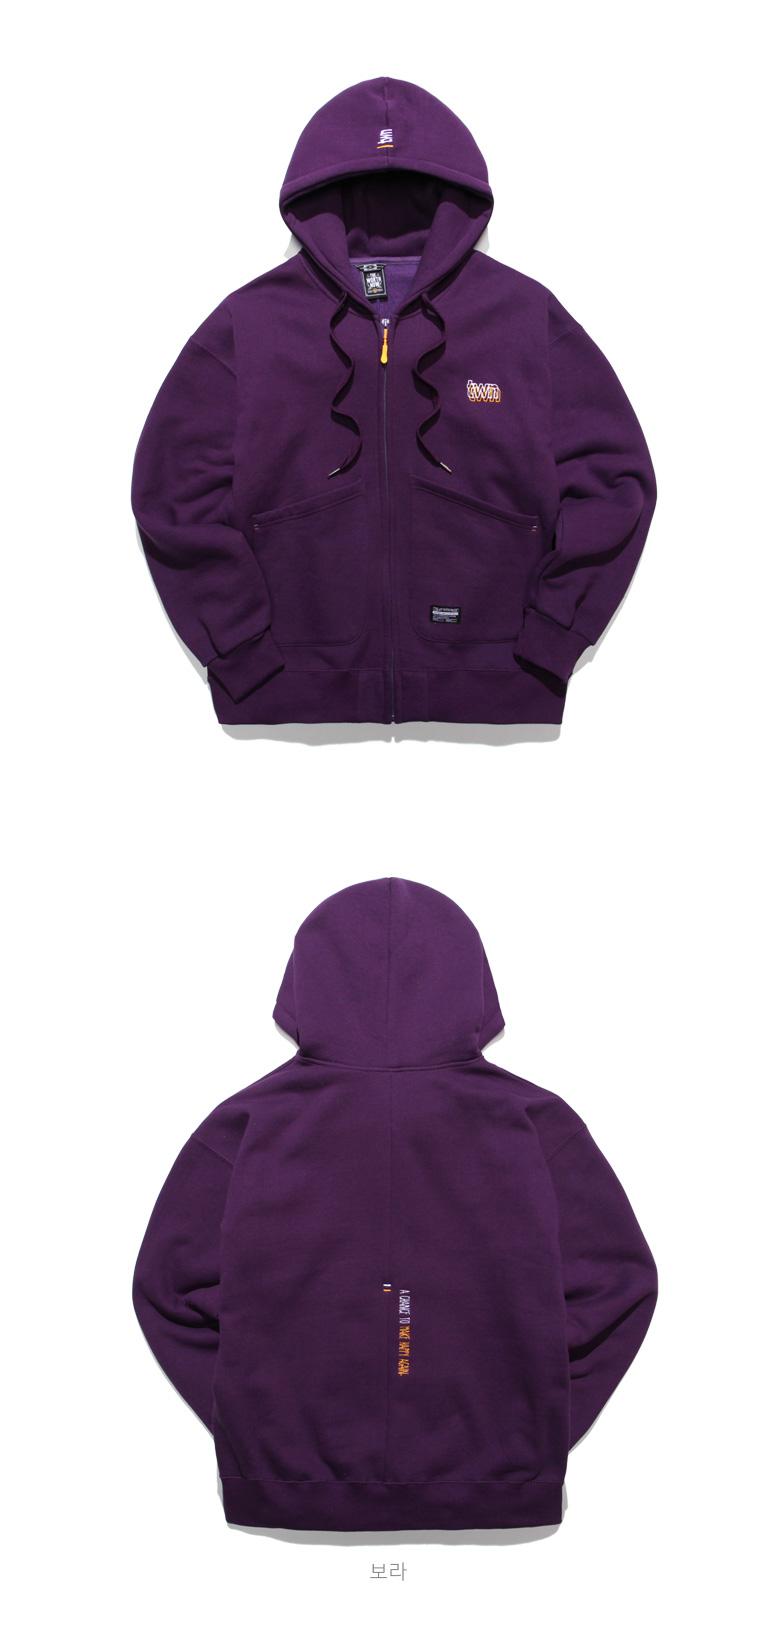 20190214_twn_minipoint_detail_violet_ym_01.jpg